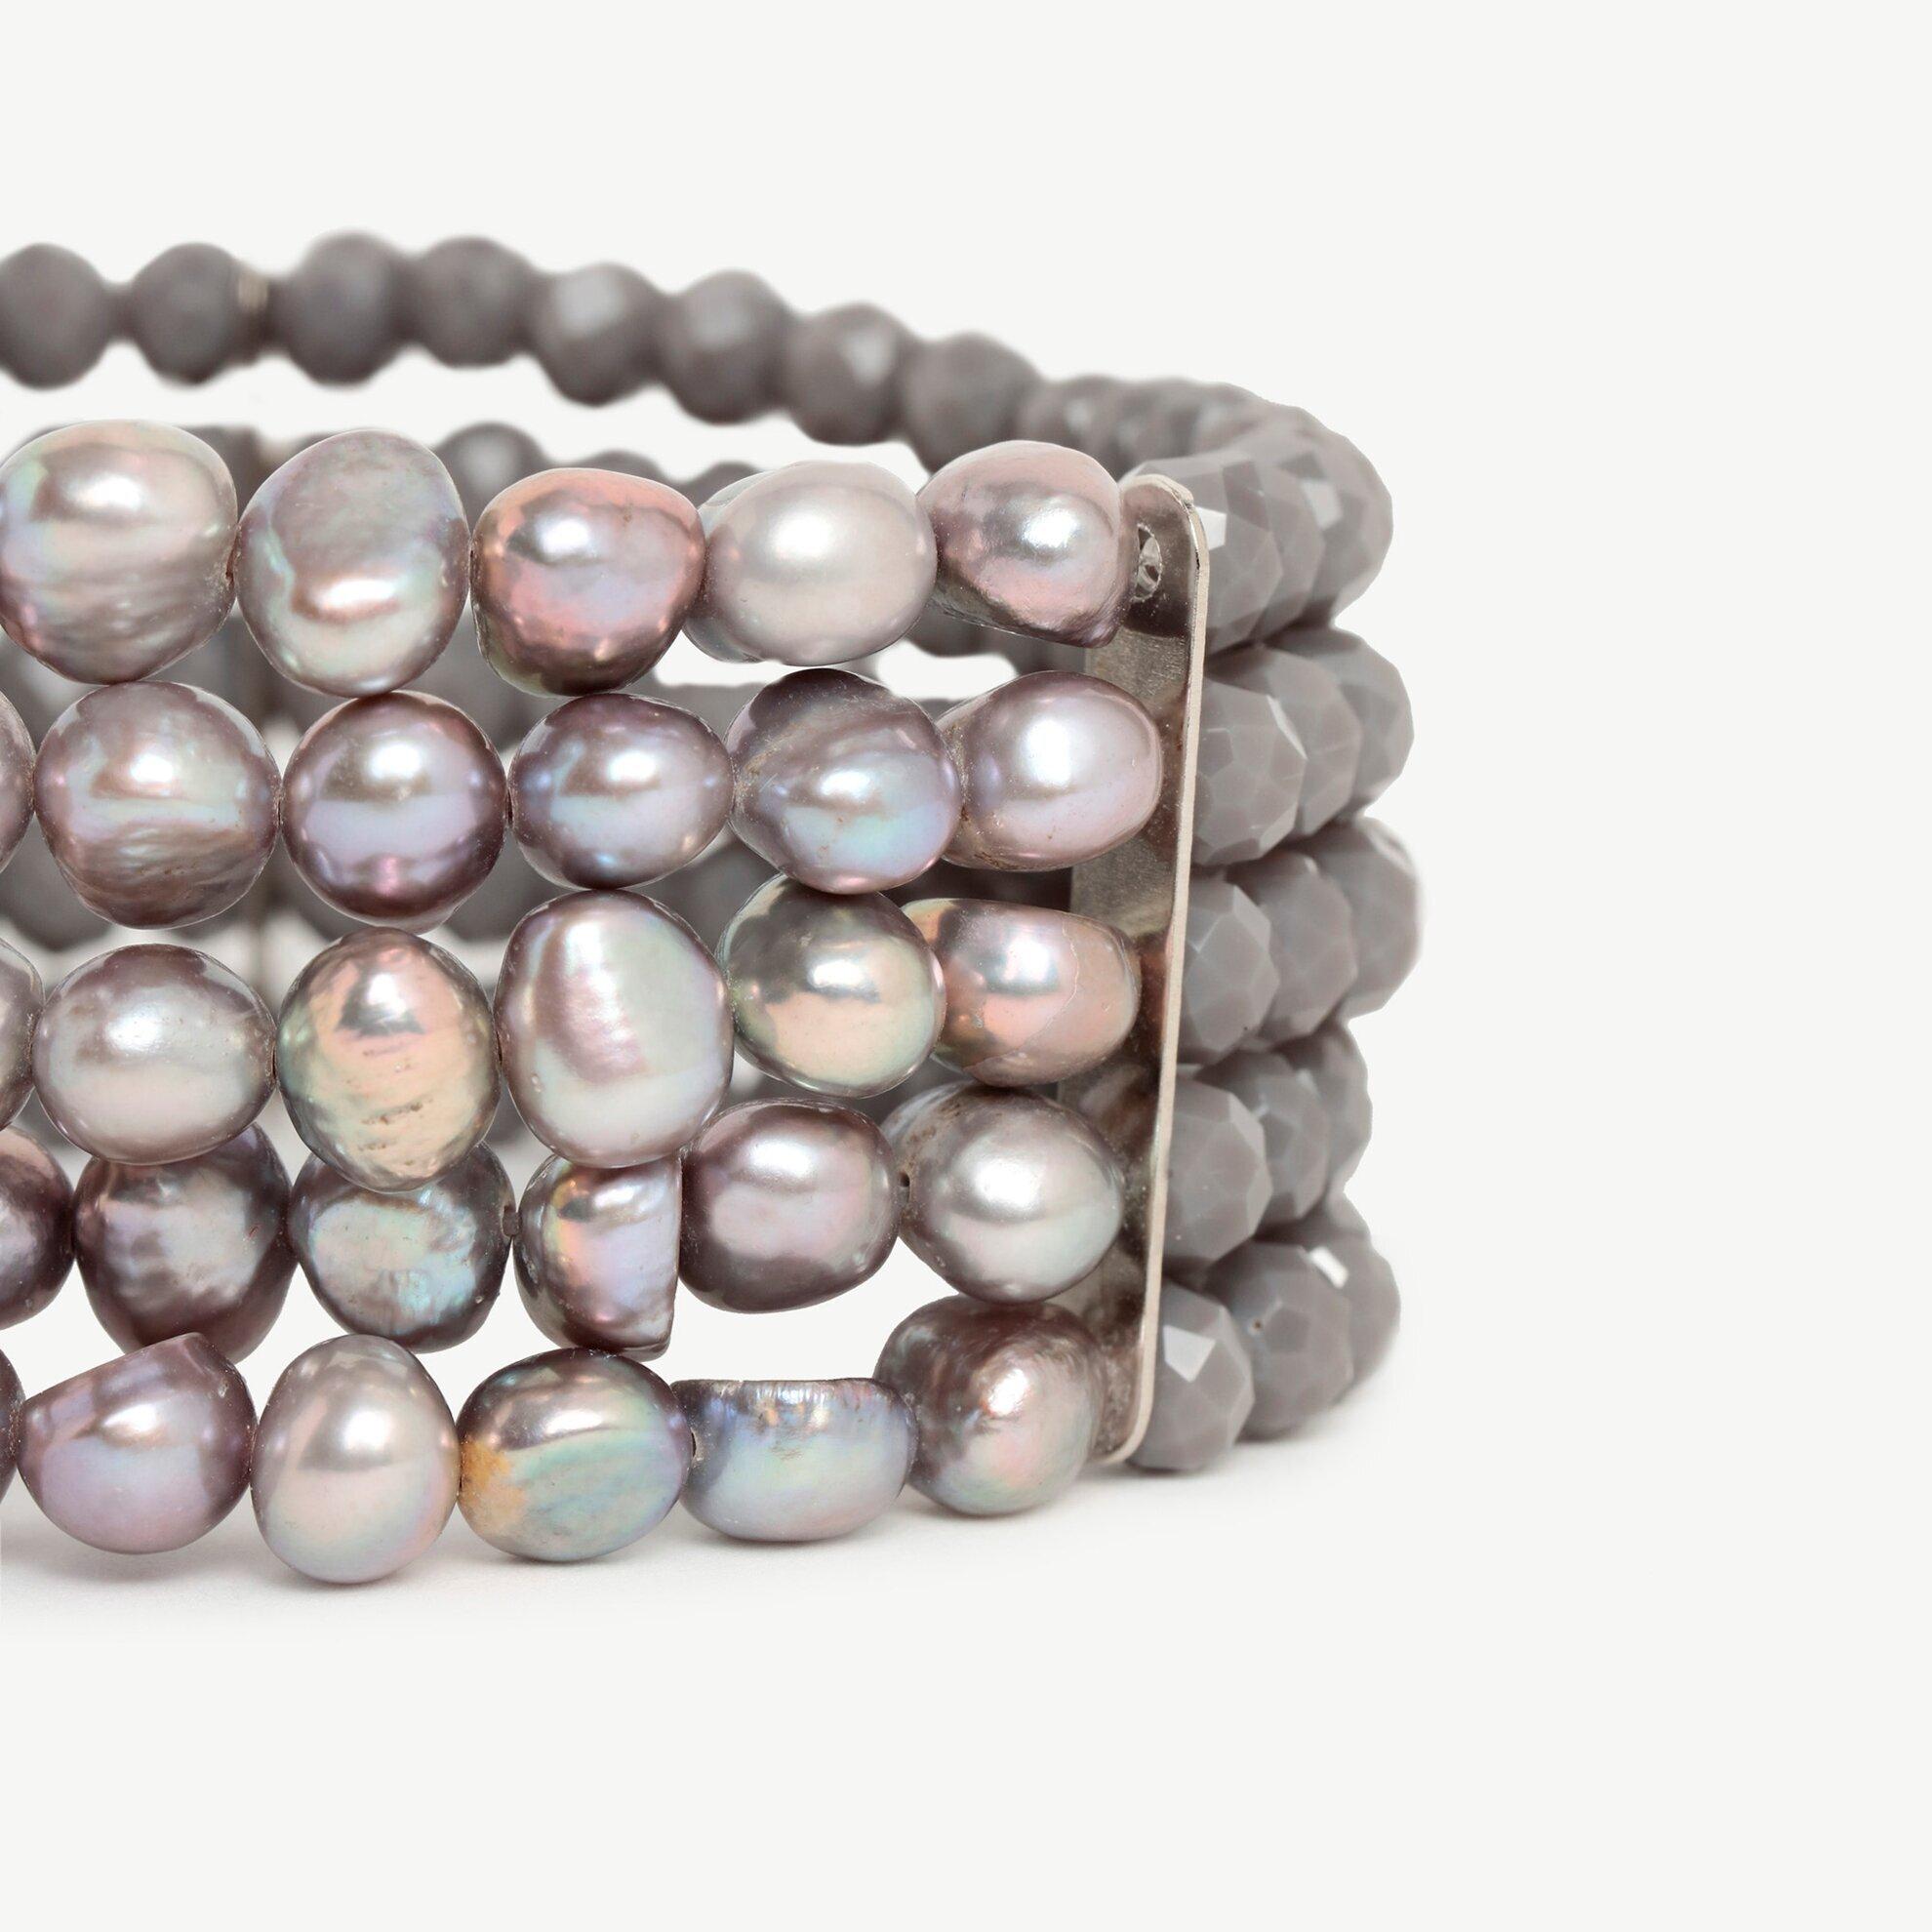 Damen Armreif 5-reihig mit Perlen